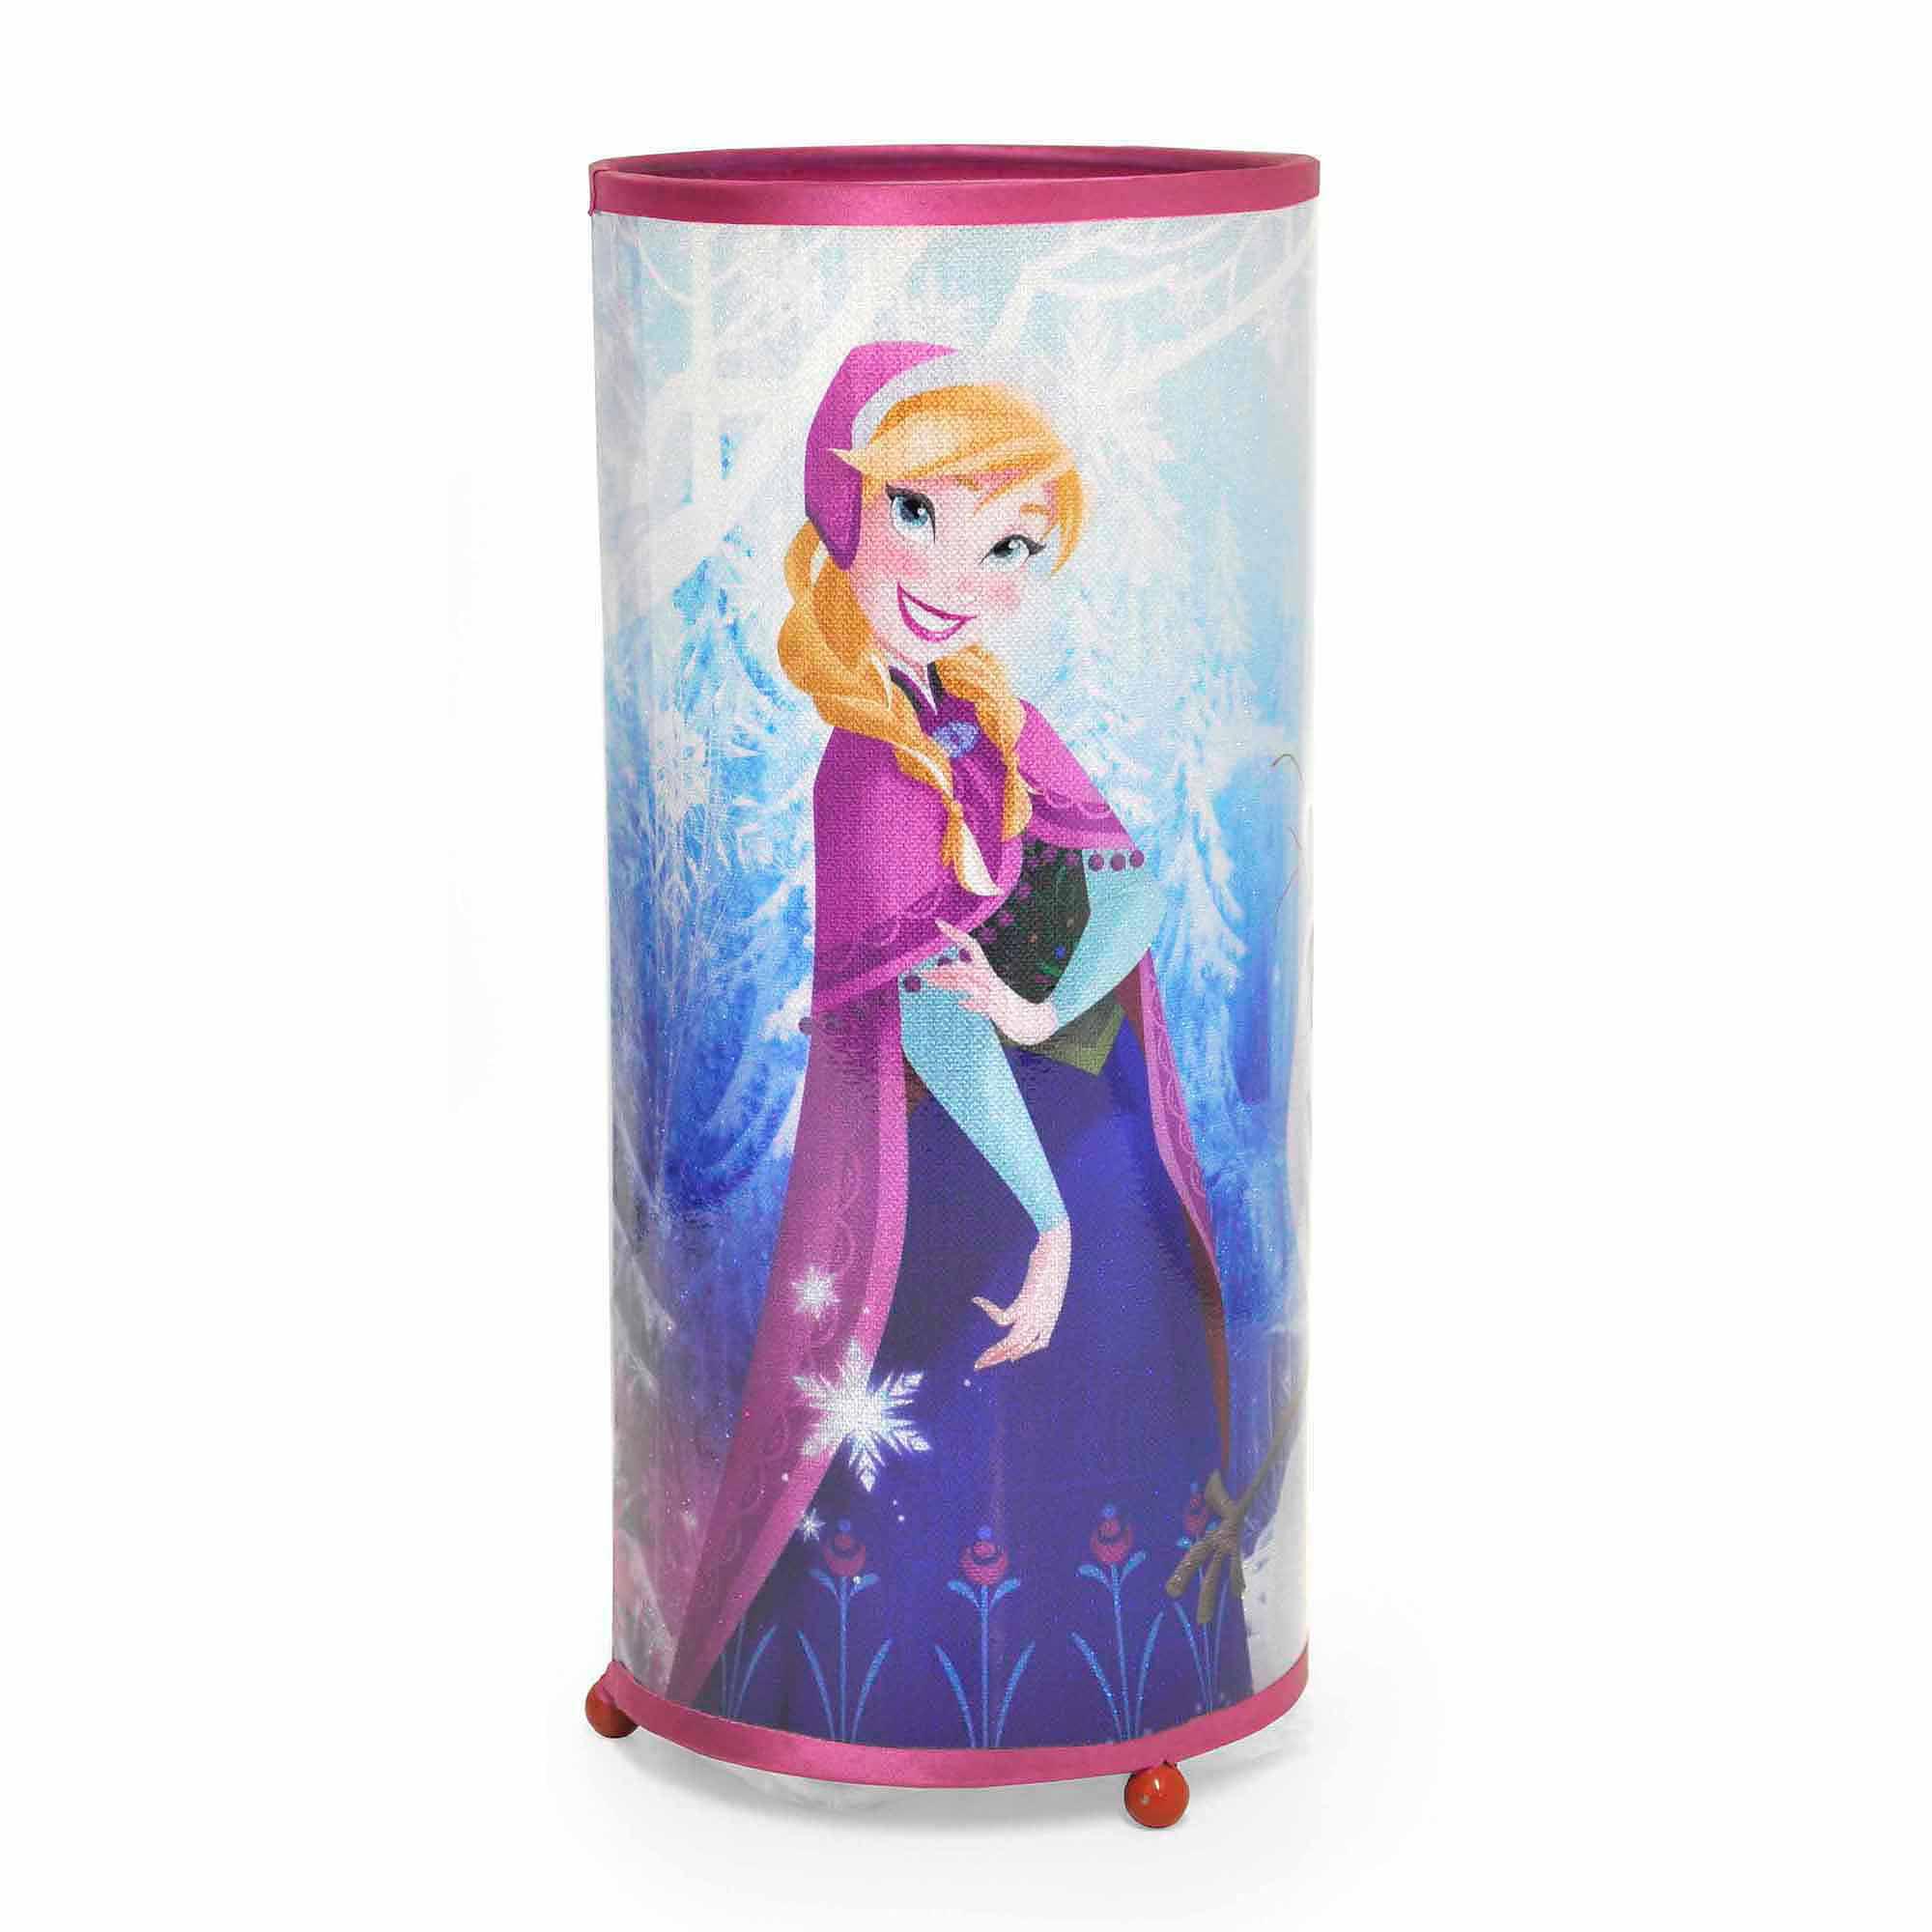 Disney Frozen Anna and Elsa Cylinder Glitter Lamp